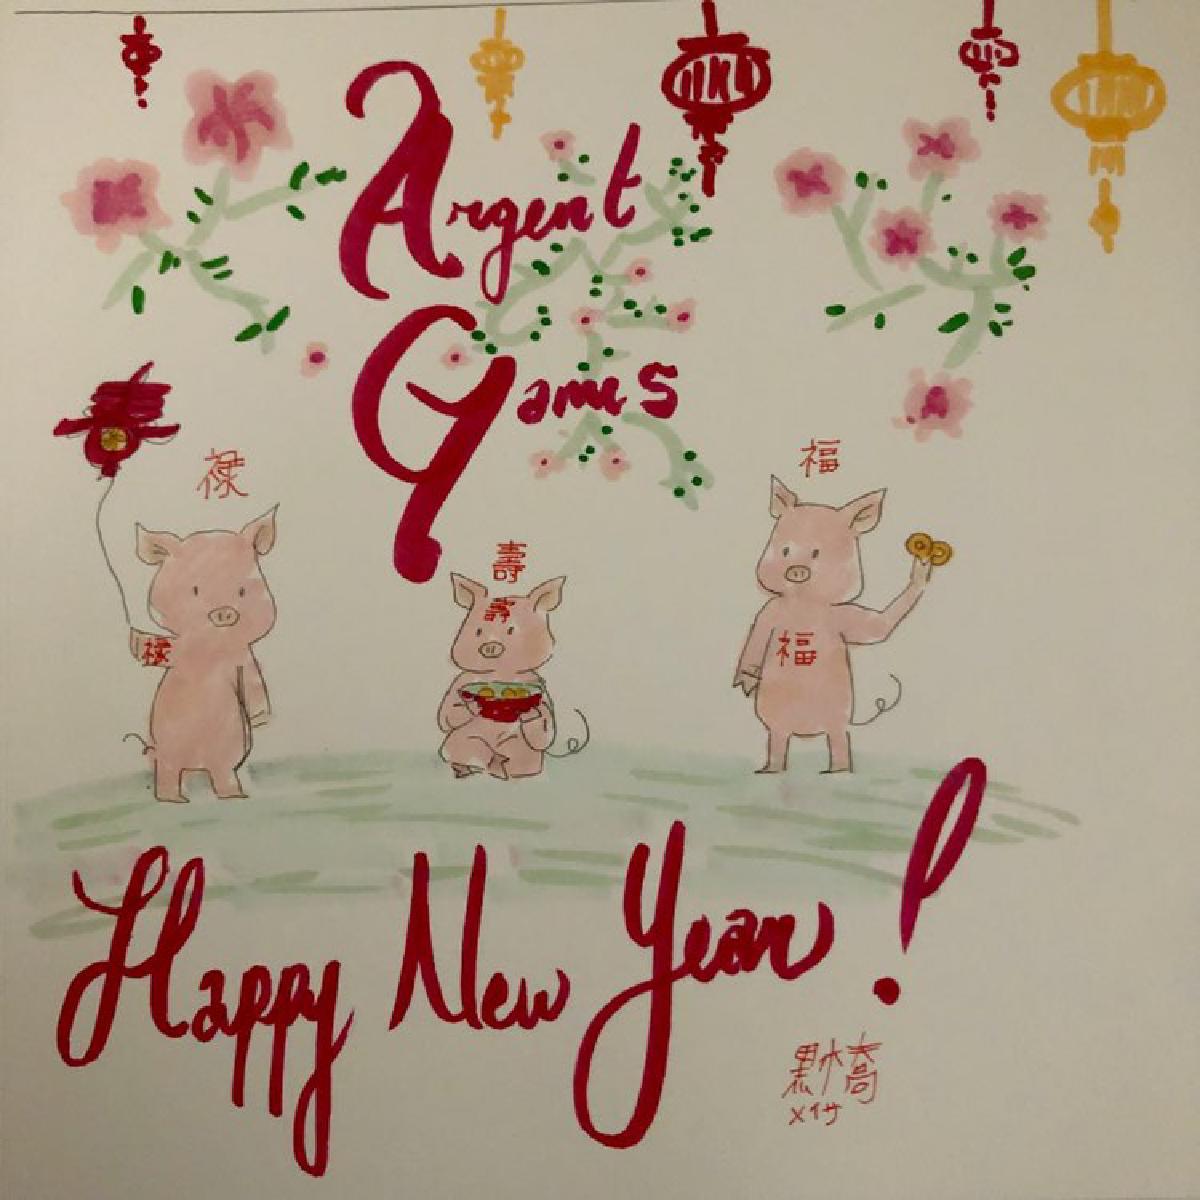 Three piggies wishing you a new year